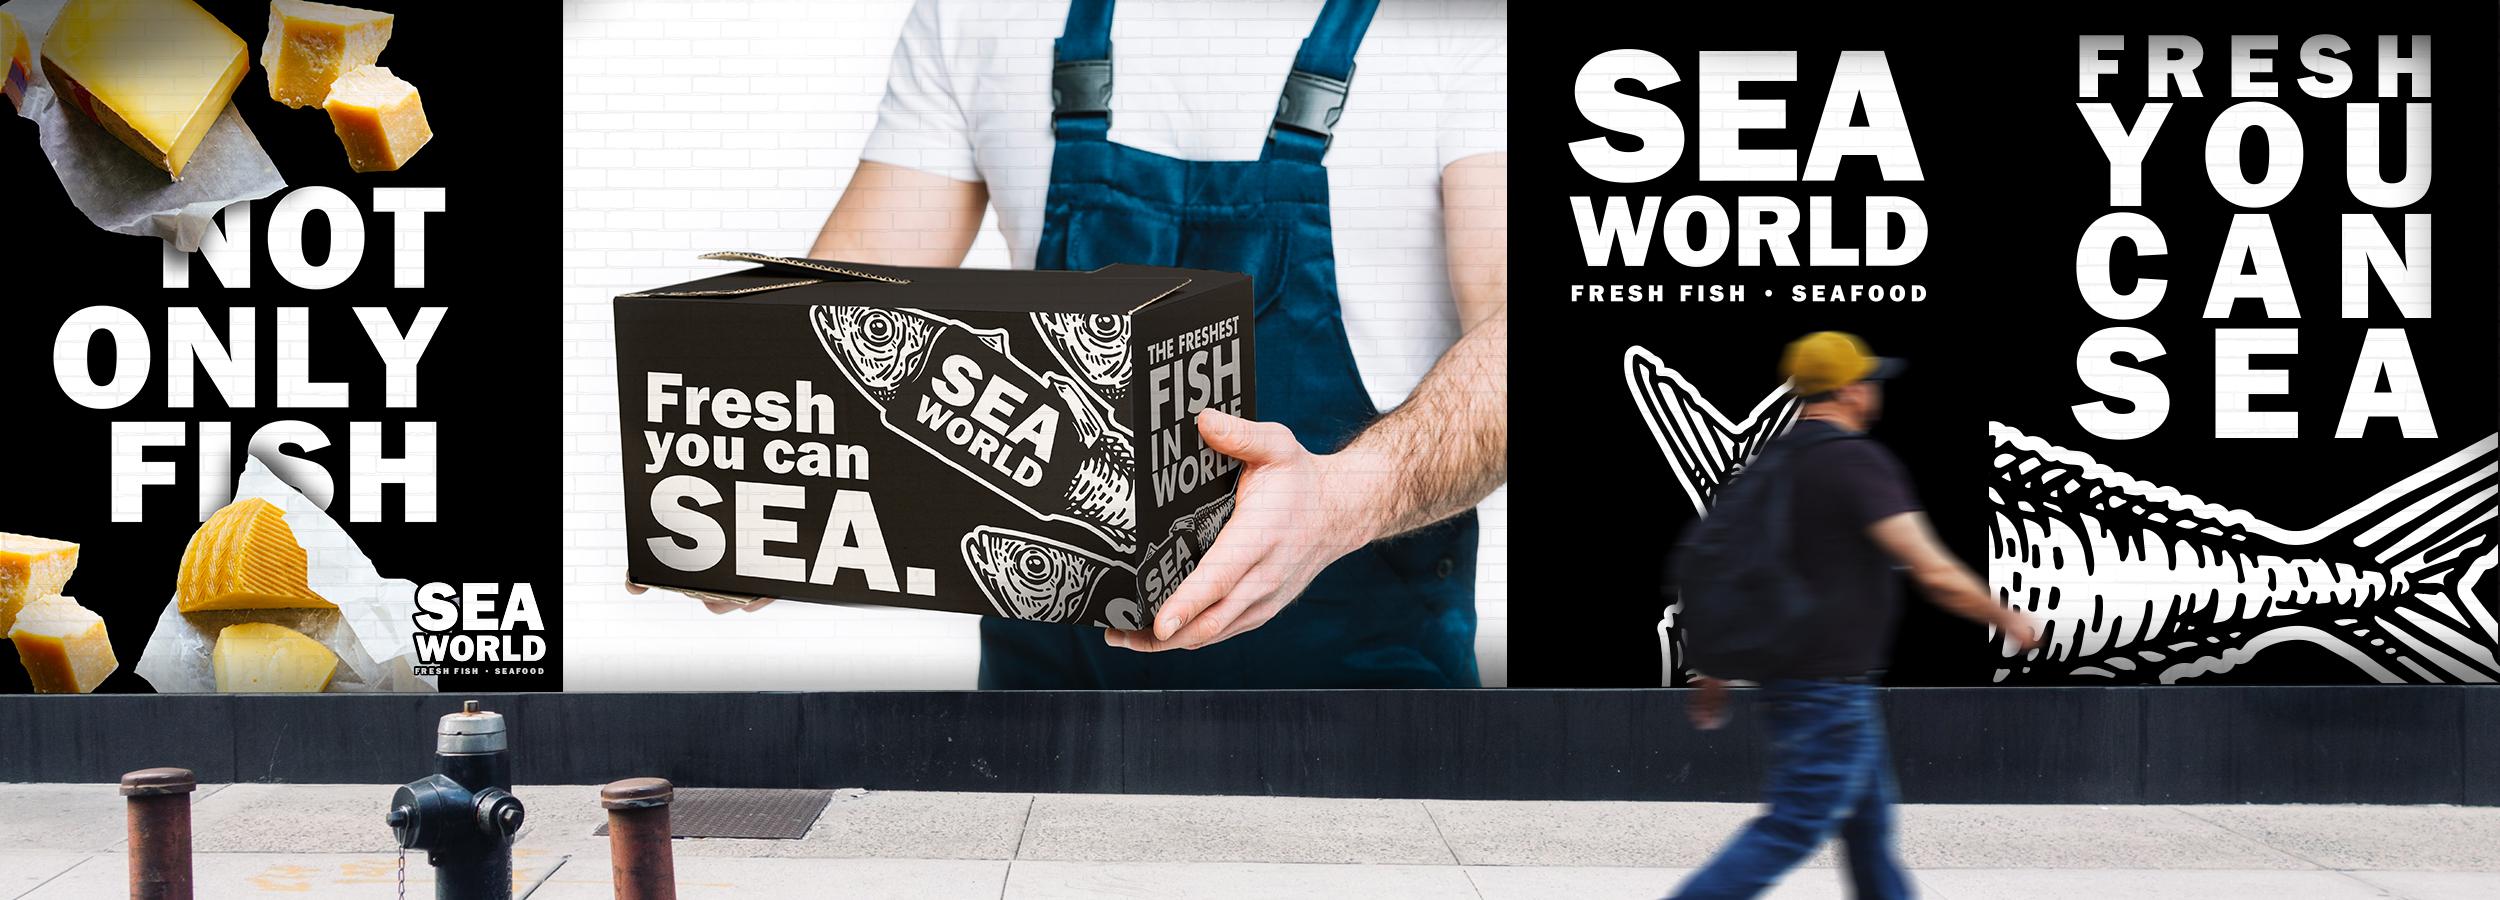 Muuaaa Design Agency Rebrands Sea World PR